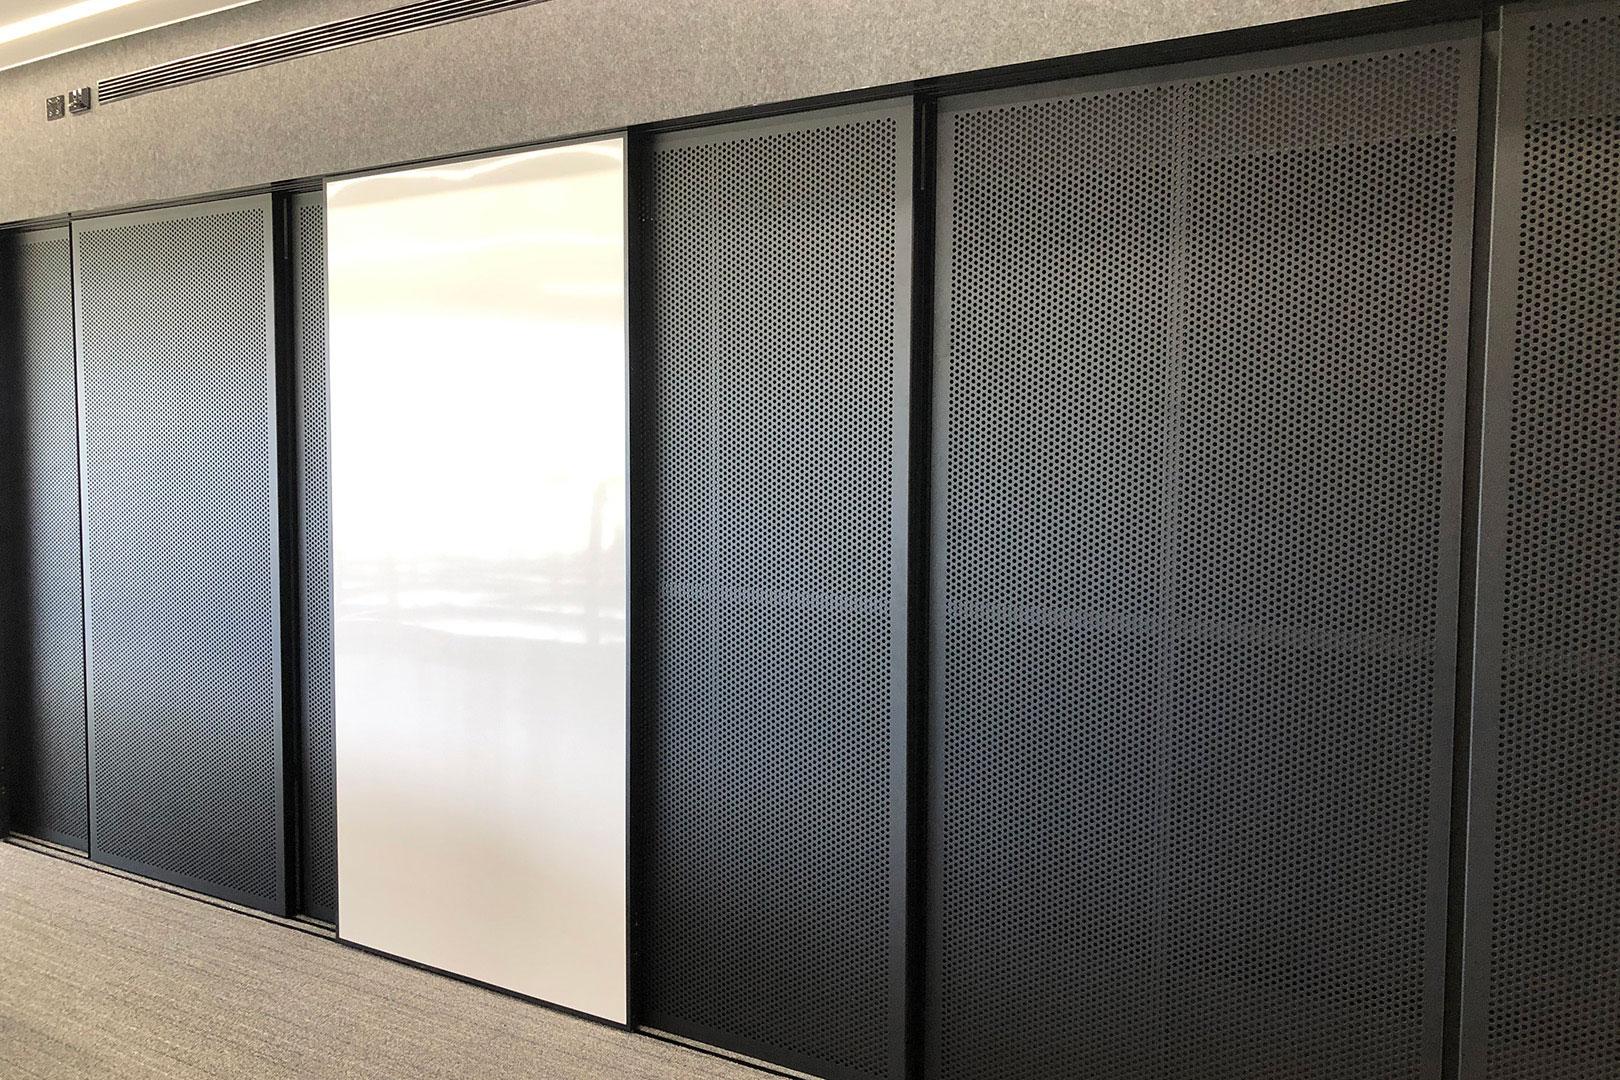 image of a decorative screen sliding door at a school